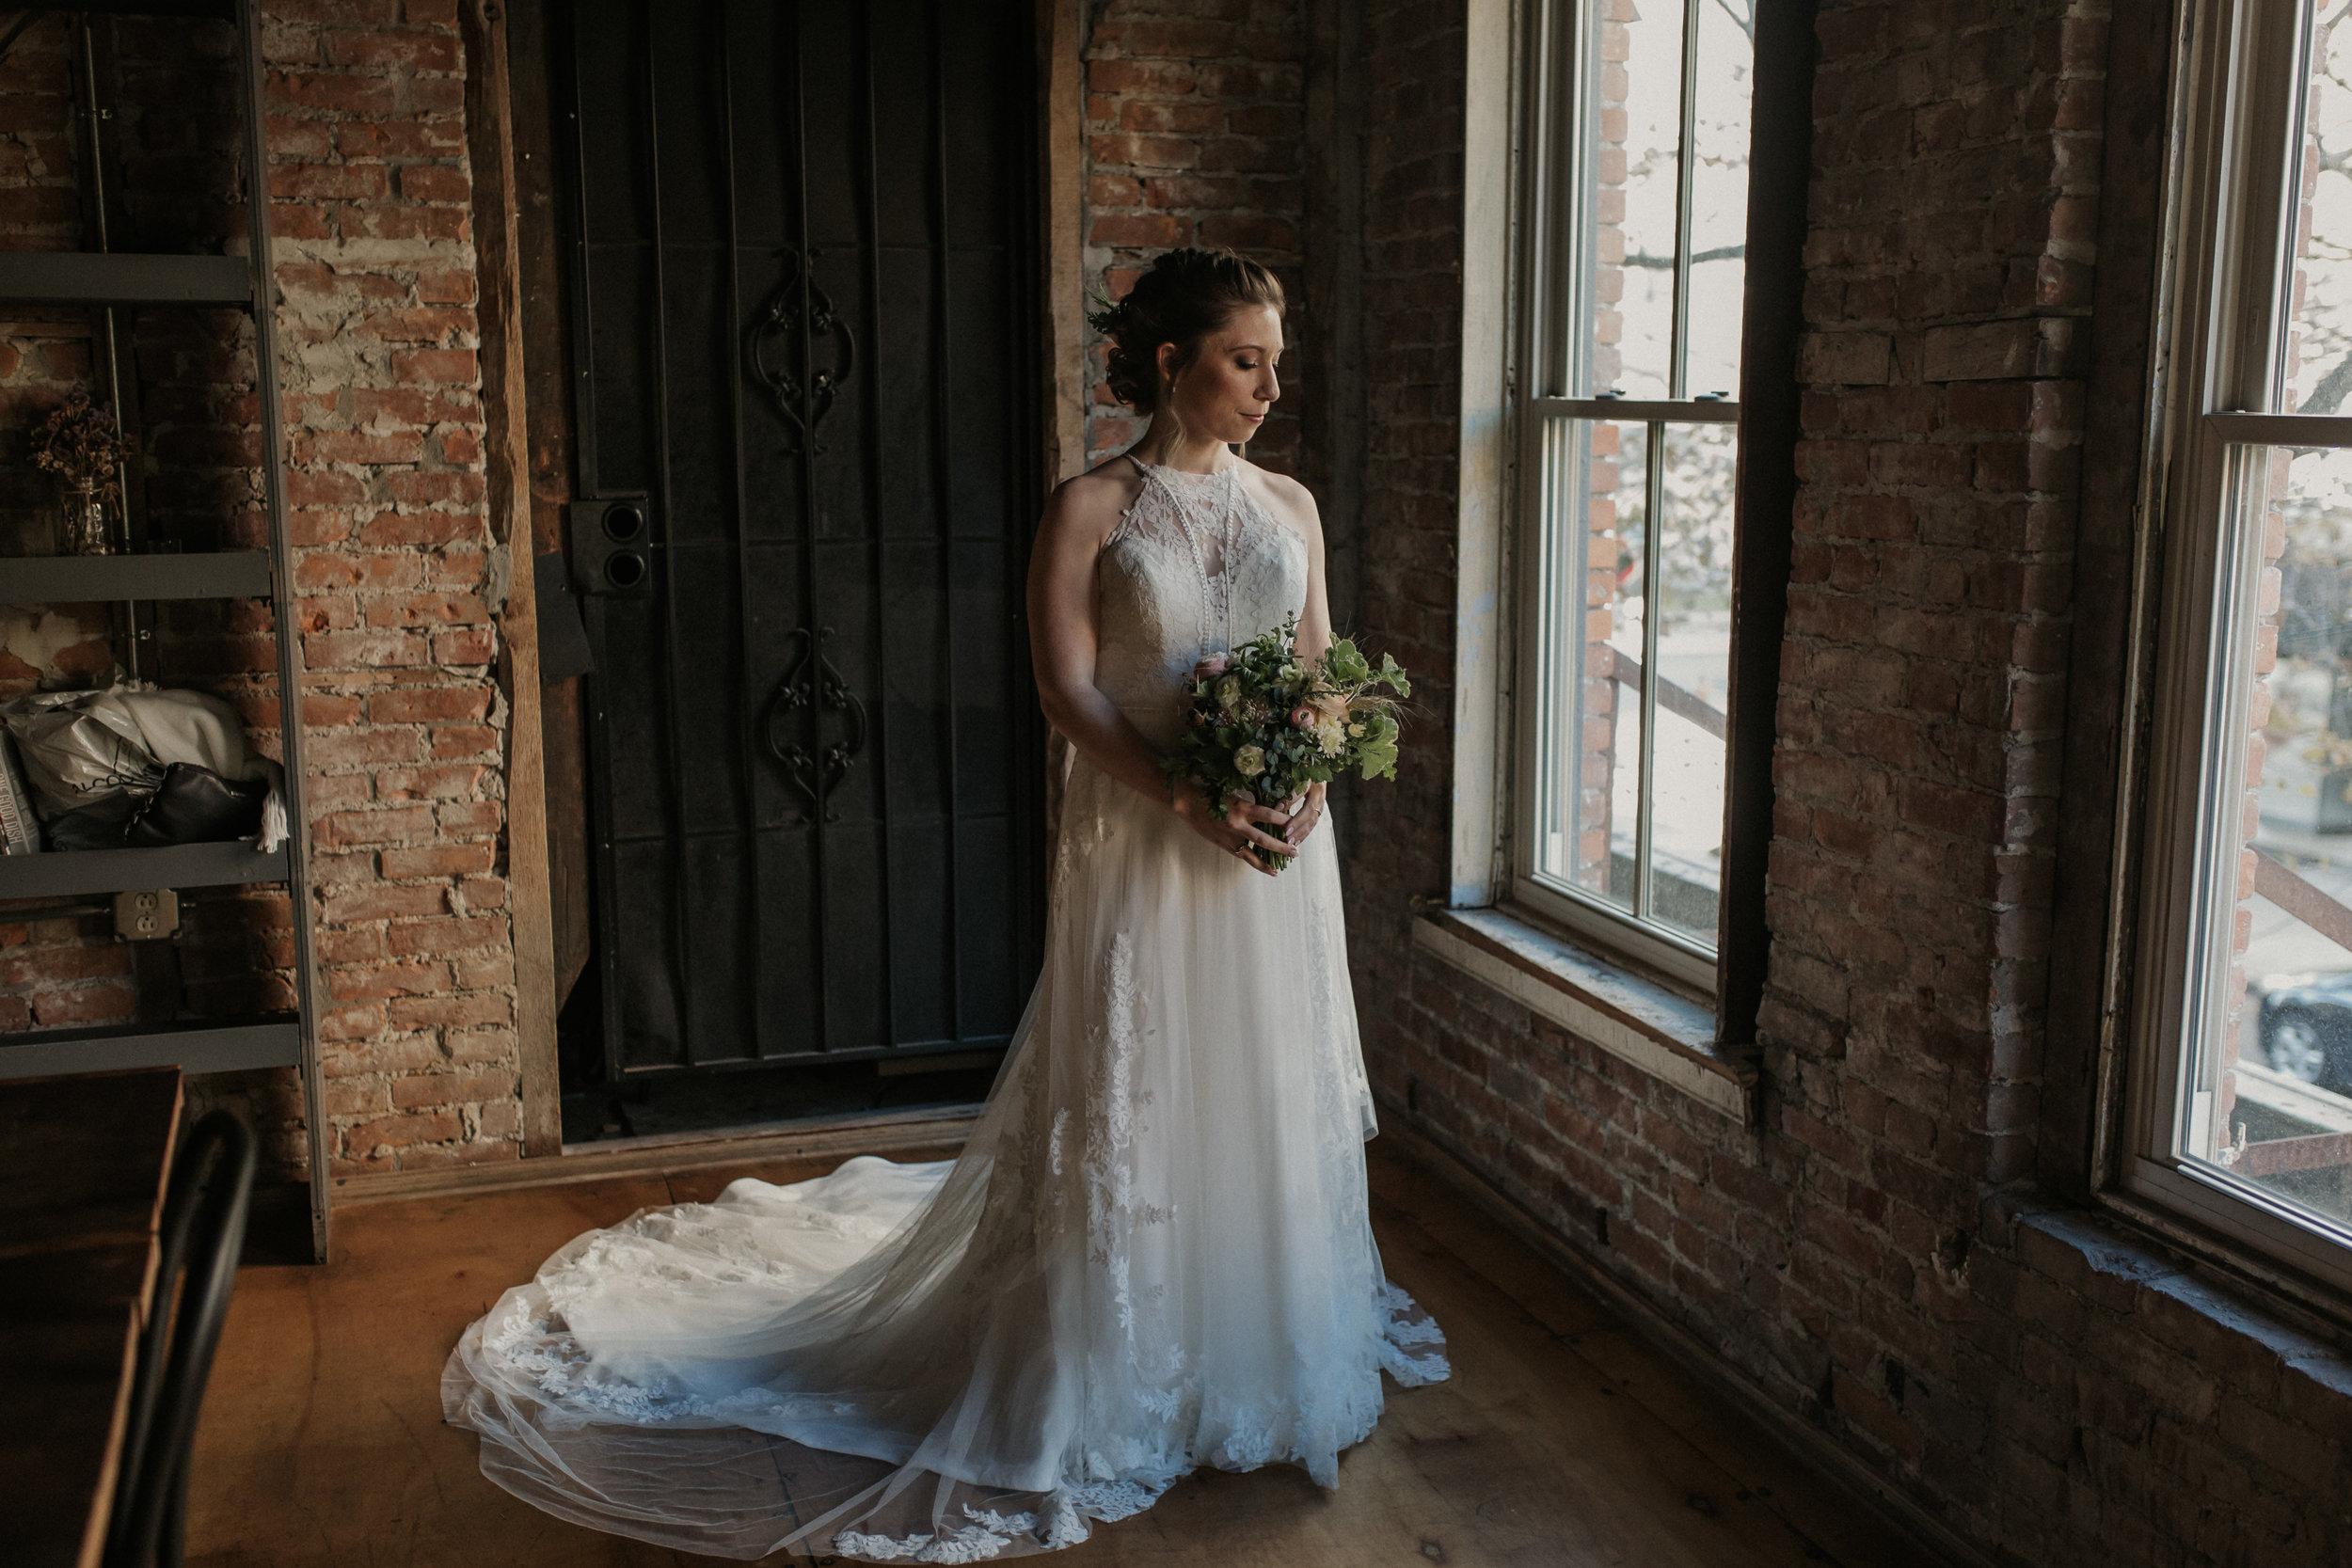 lucas_confectionery_wedding_014.JPG